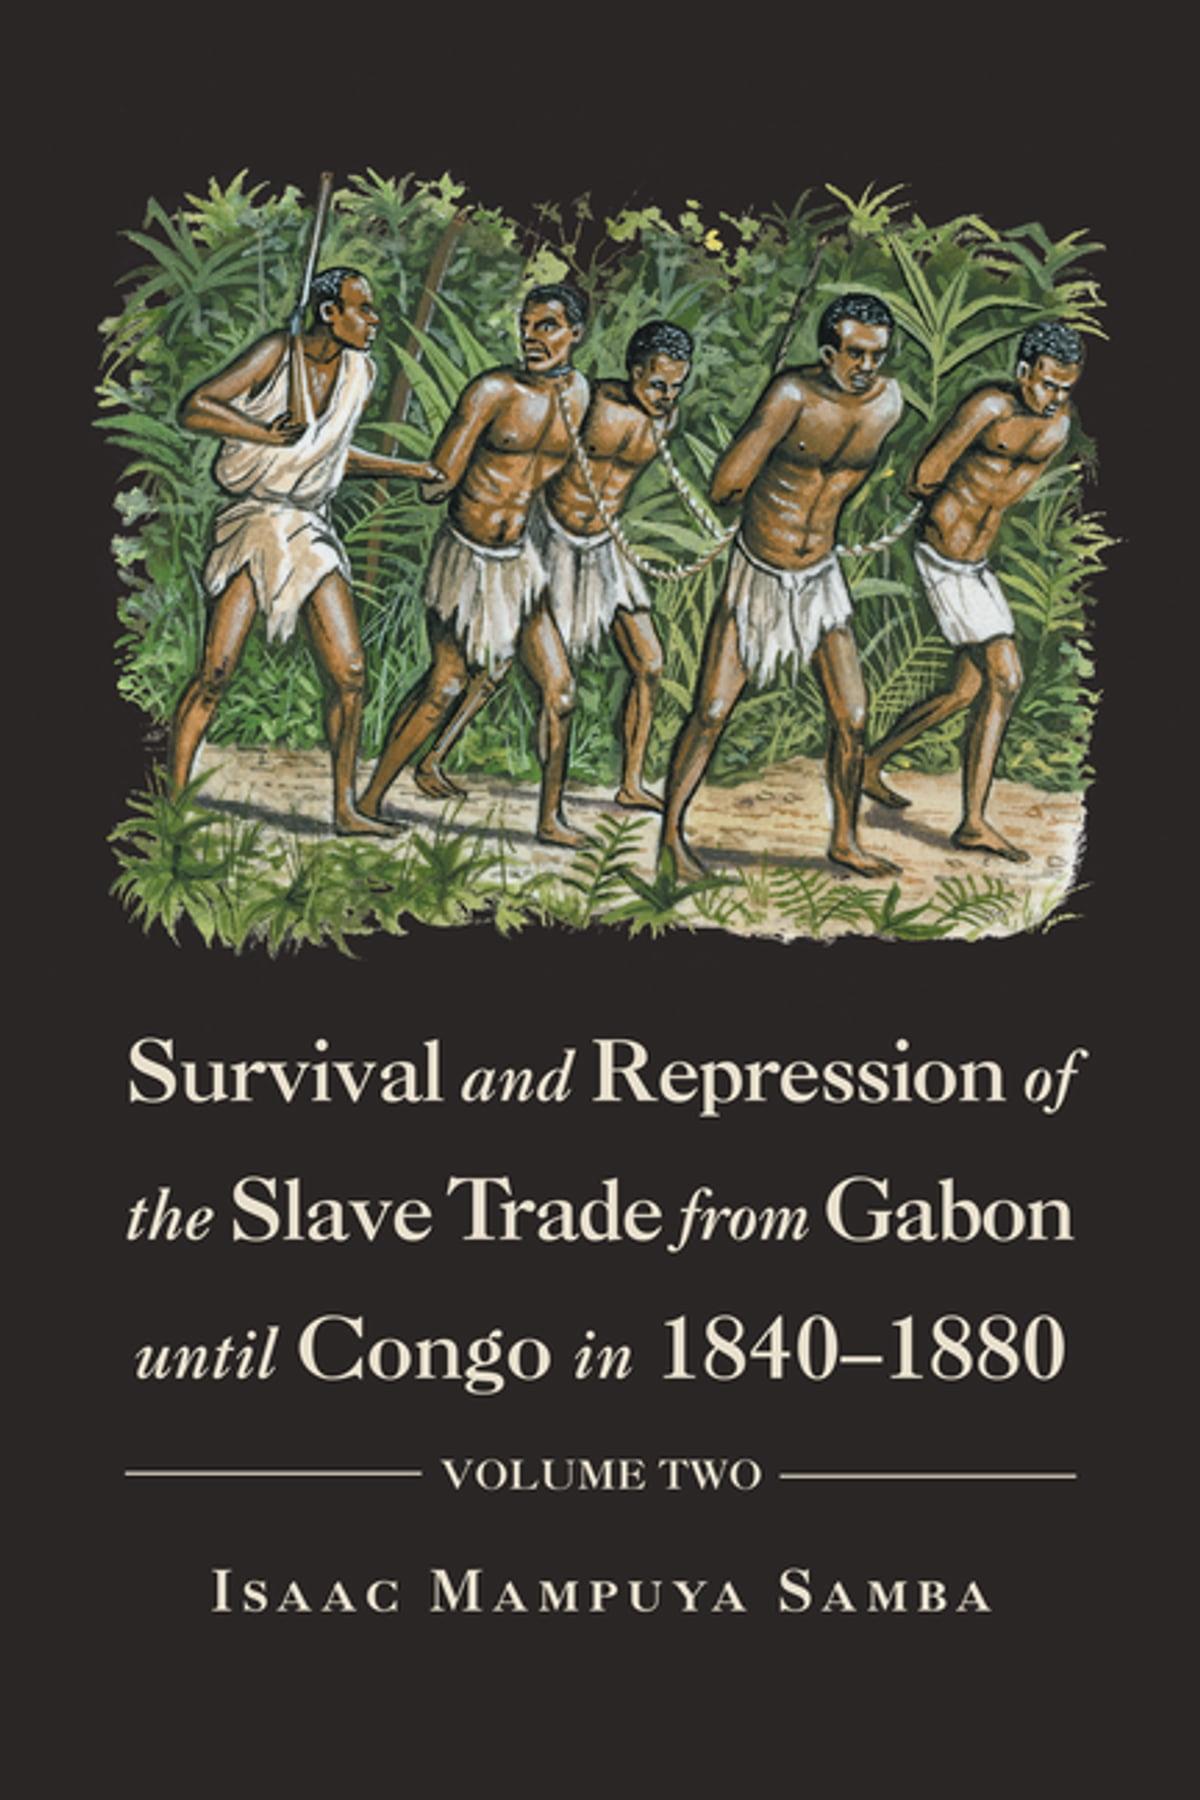 Survival and Repression of the Slave Trade from Gabon Until Congo in 1840–1880 eBook by Isaac Mampuya Samba - 9781546291022   Rakuten Kobo